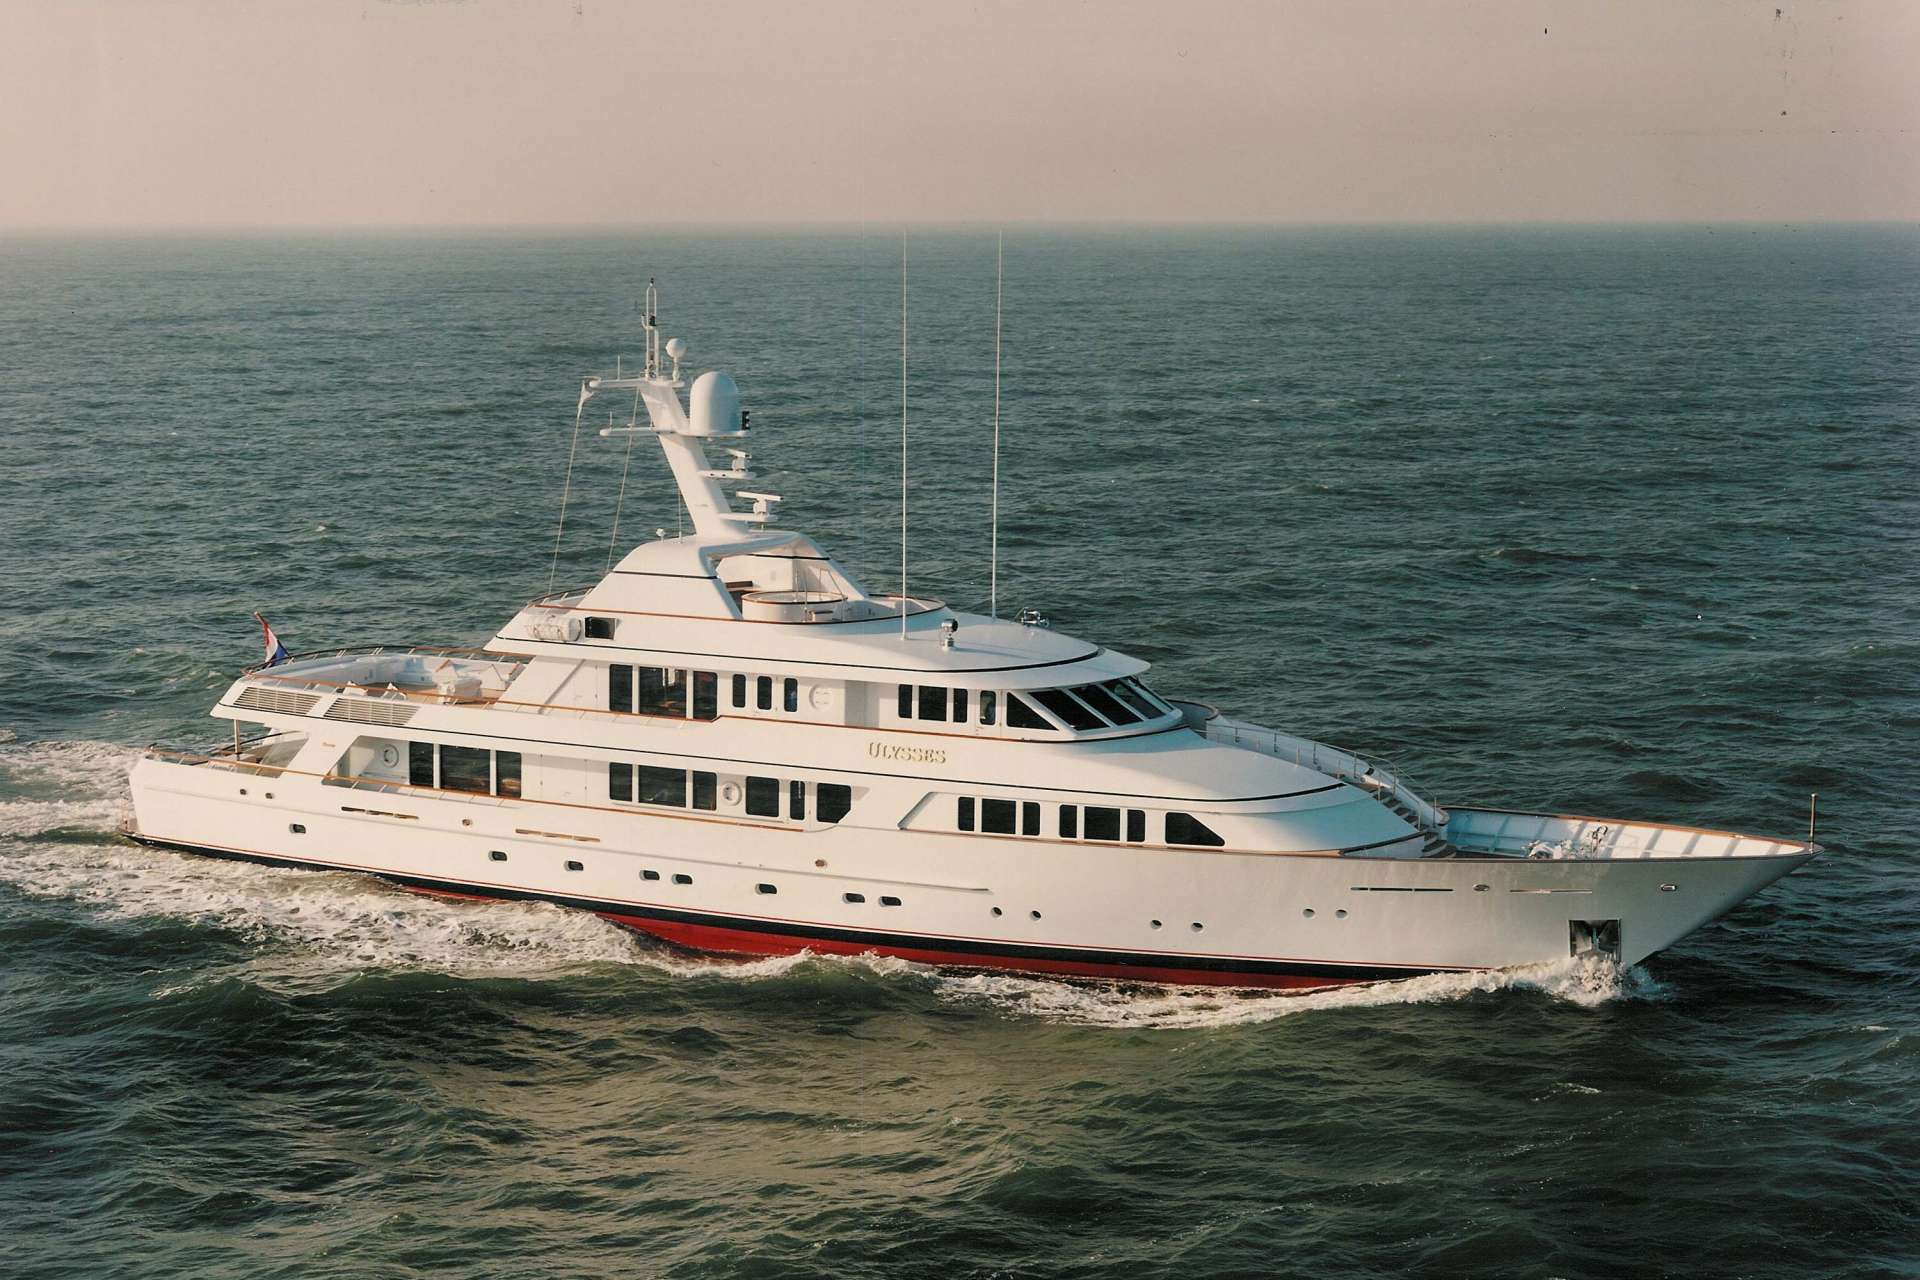 Ulysses - Feadship Royal Dutch Shipyards